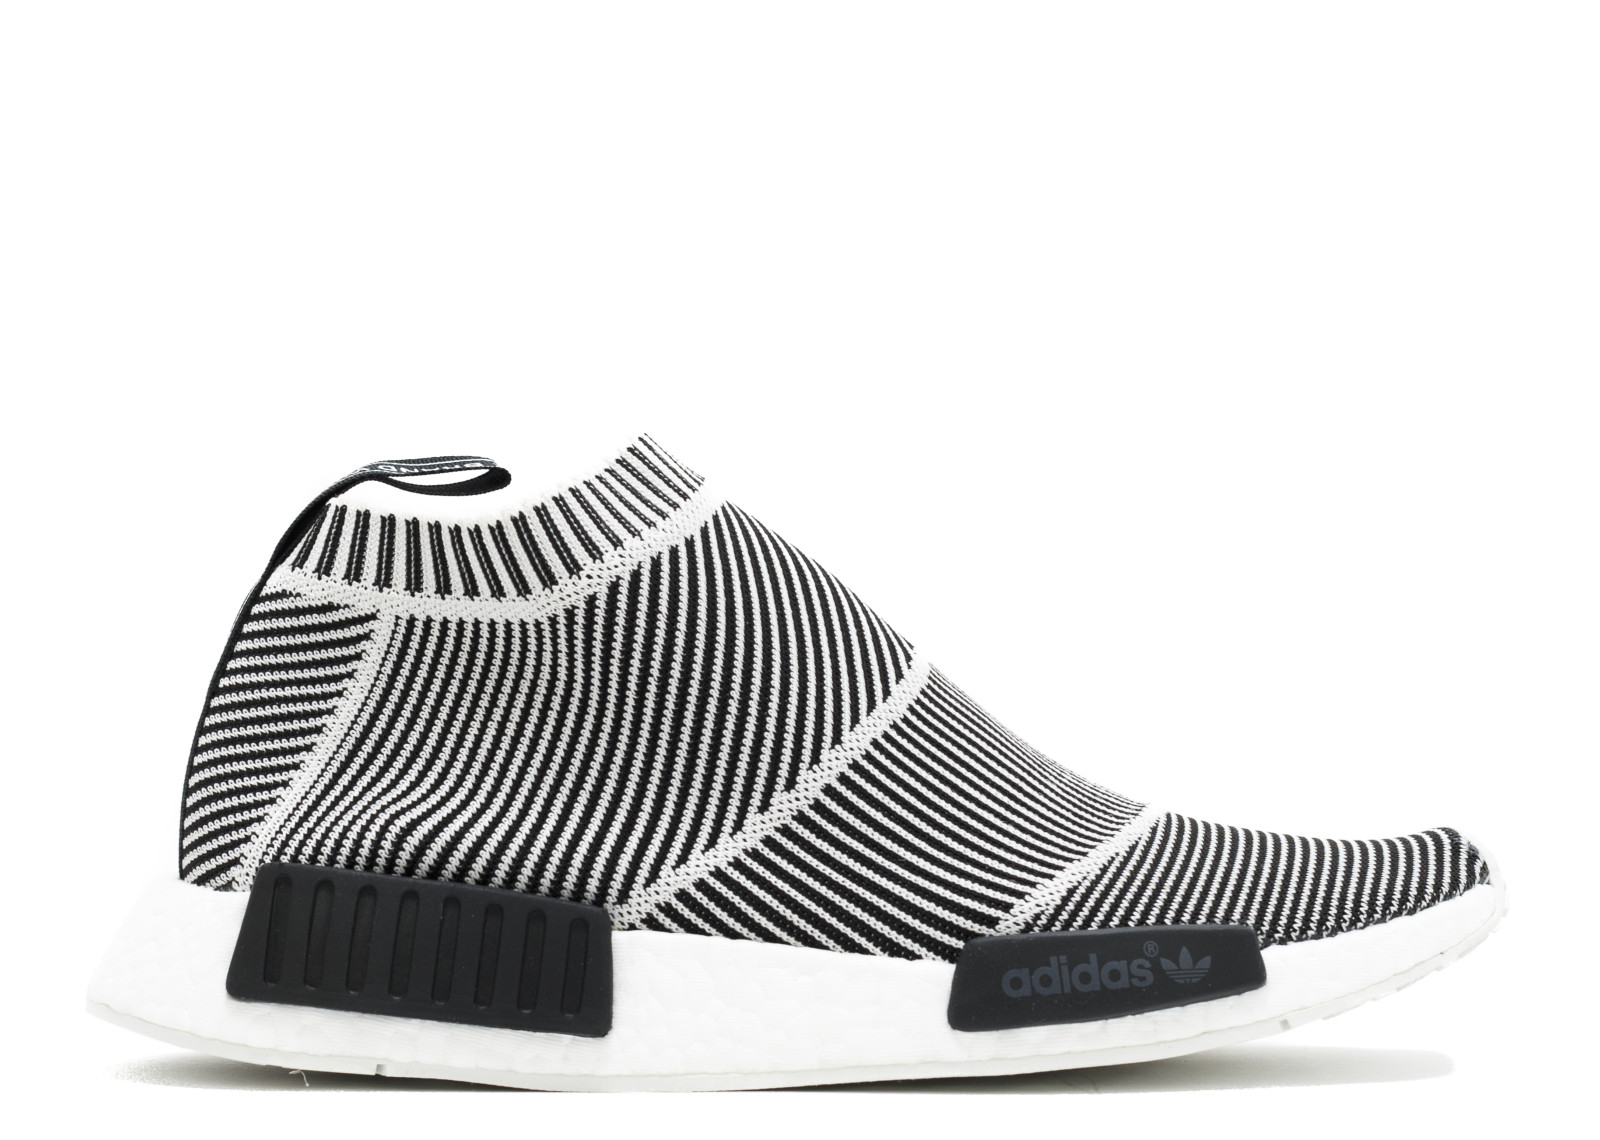 batalla Escalofriante profundo  Kick Avenue - adidas NMD City Sock Core Black